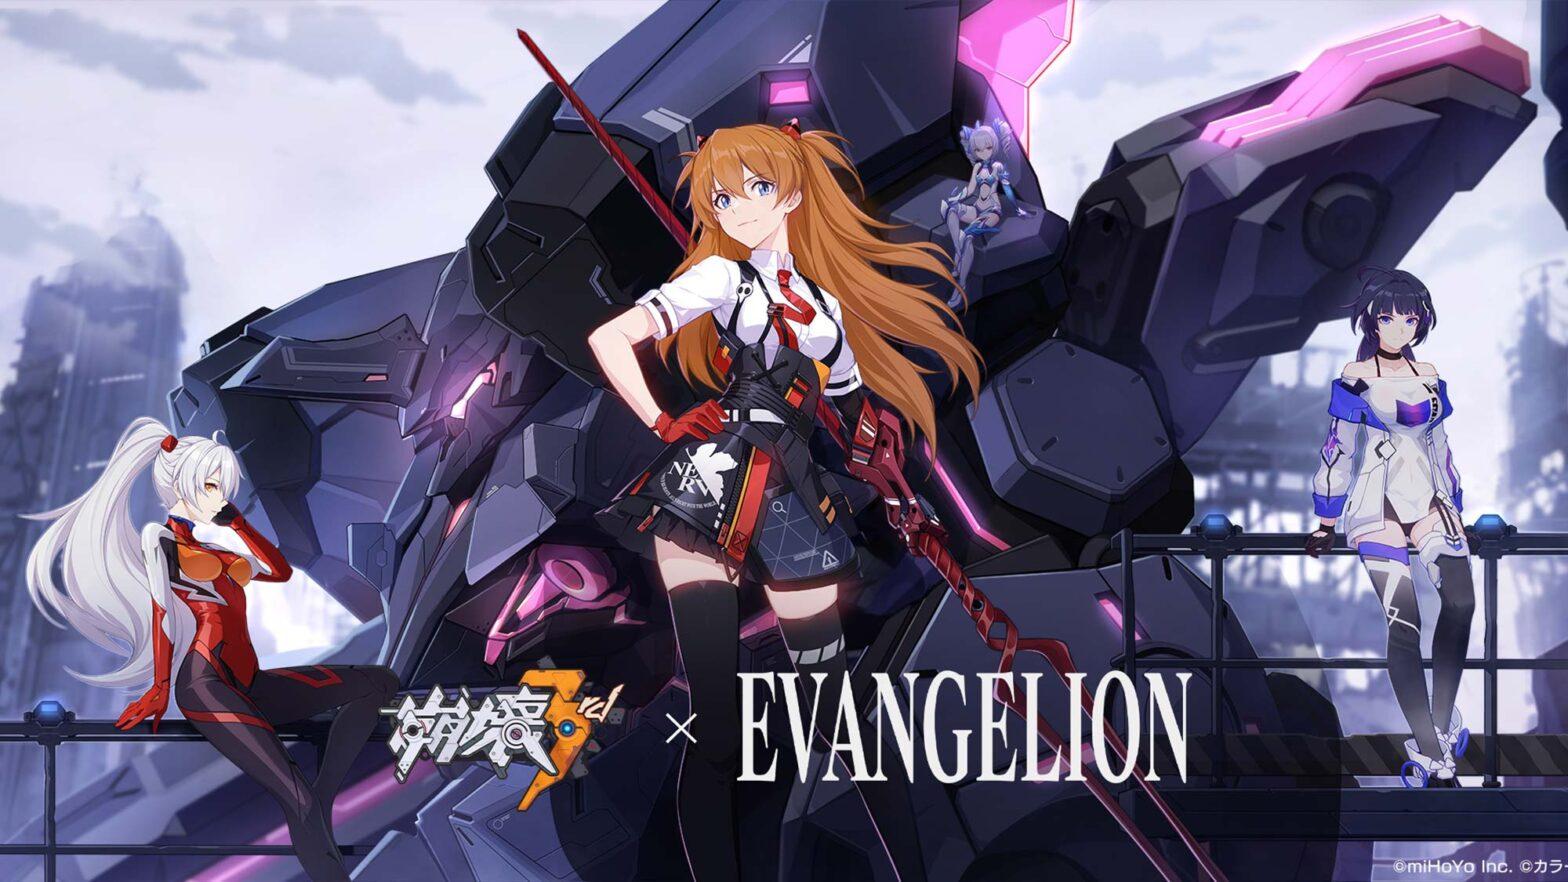 Evangelion x Honkai Impact 3rd Mobile Game